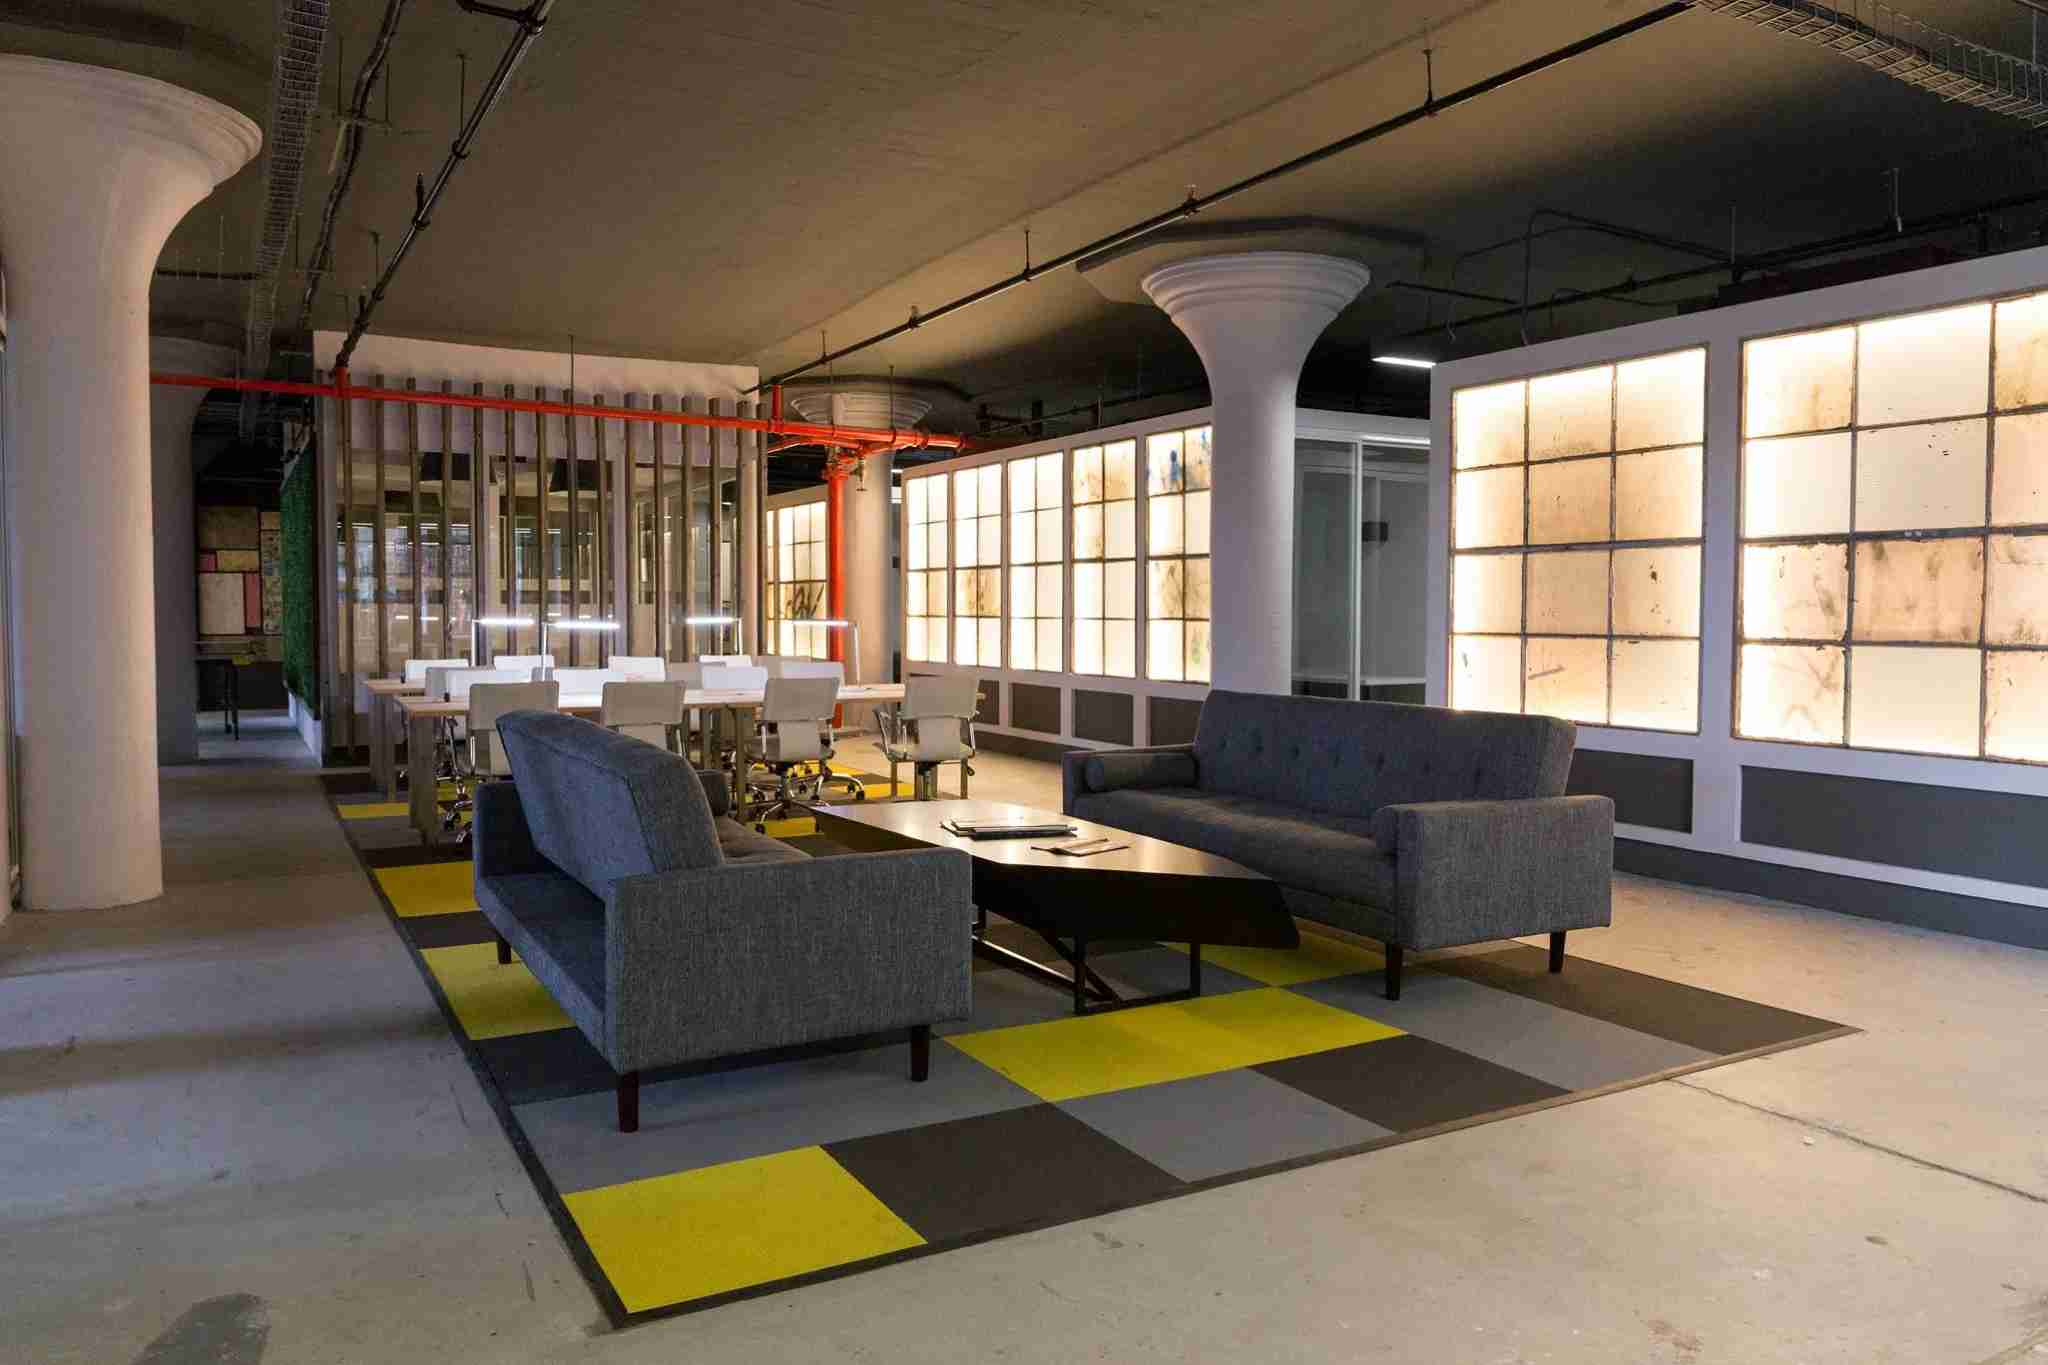 Brooklyn Desks offers hot desks, dedicated desks and private offices (via Brooklyn Desks/Facebook)